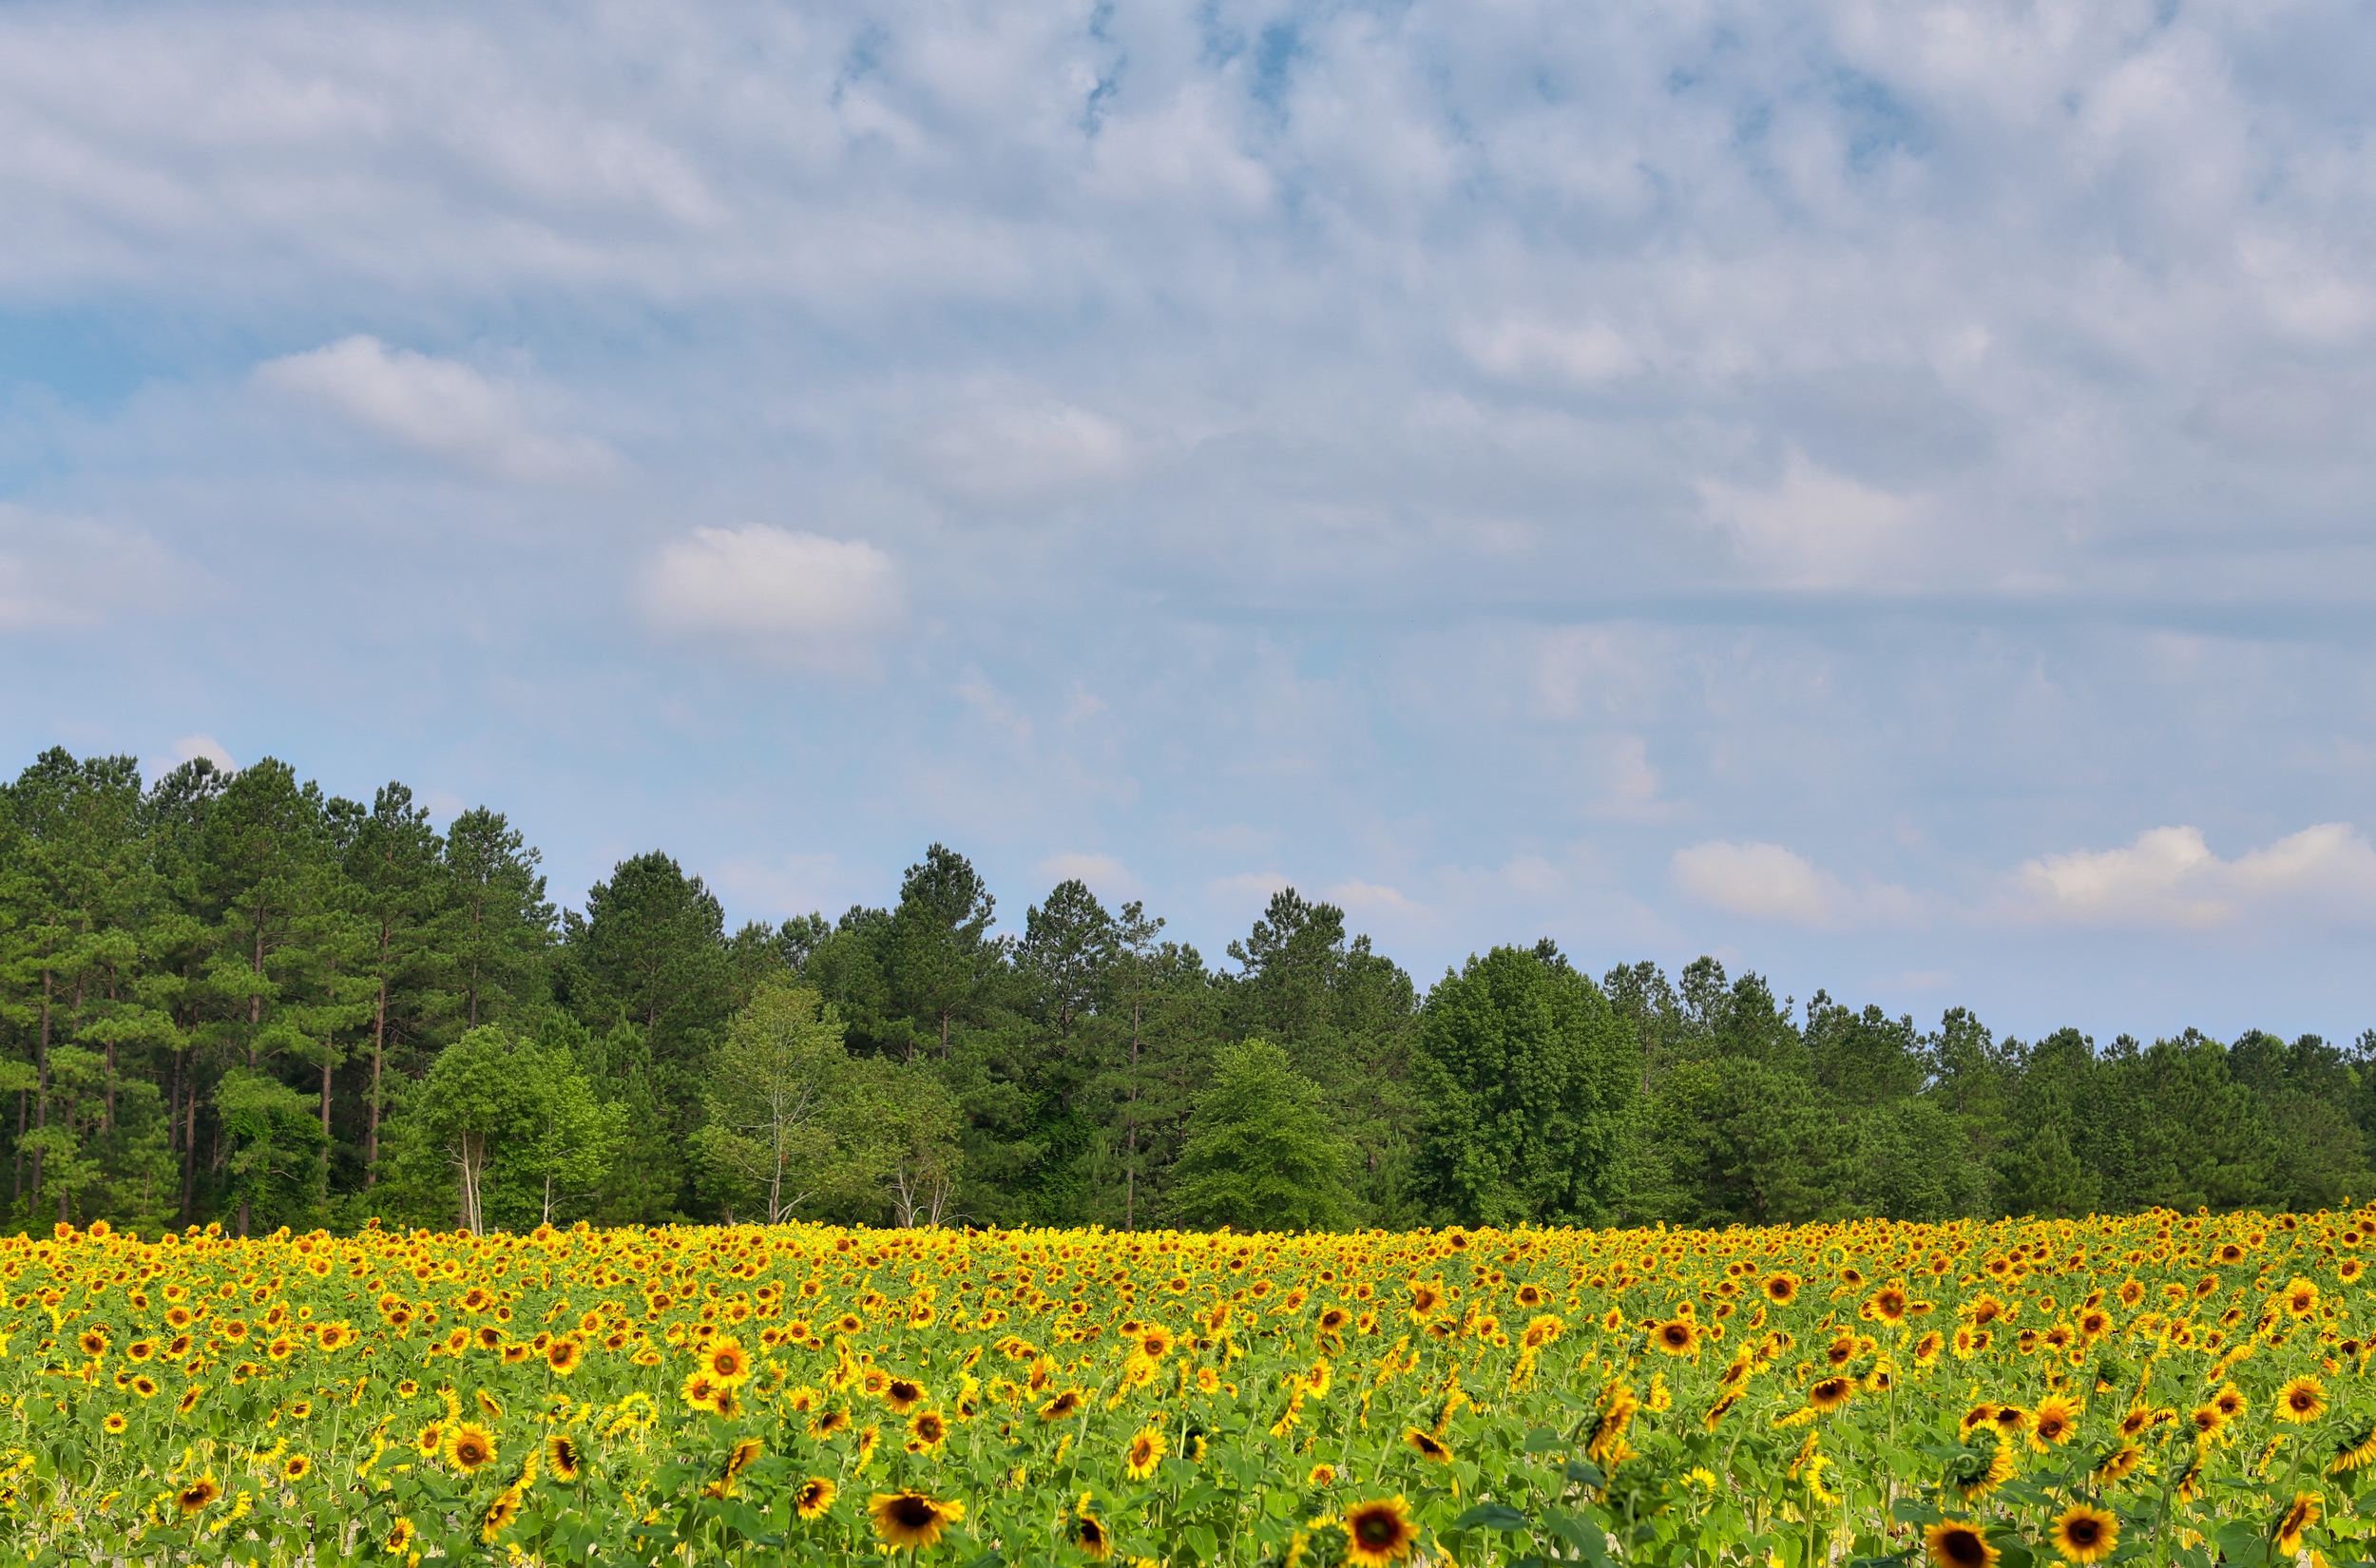 Sunflower Field, Jon Courville Photography